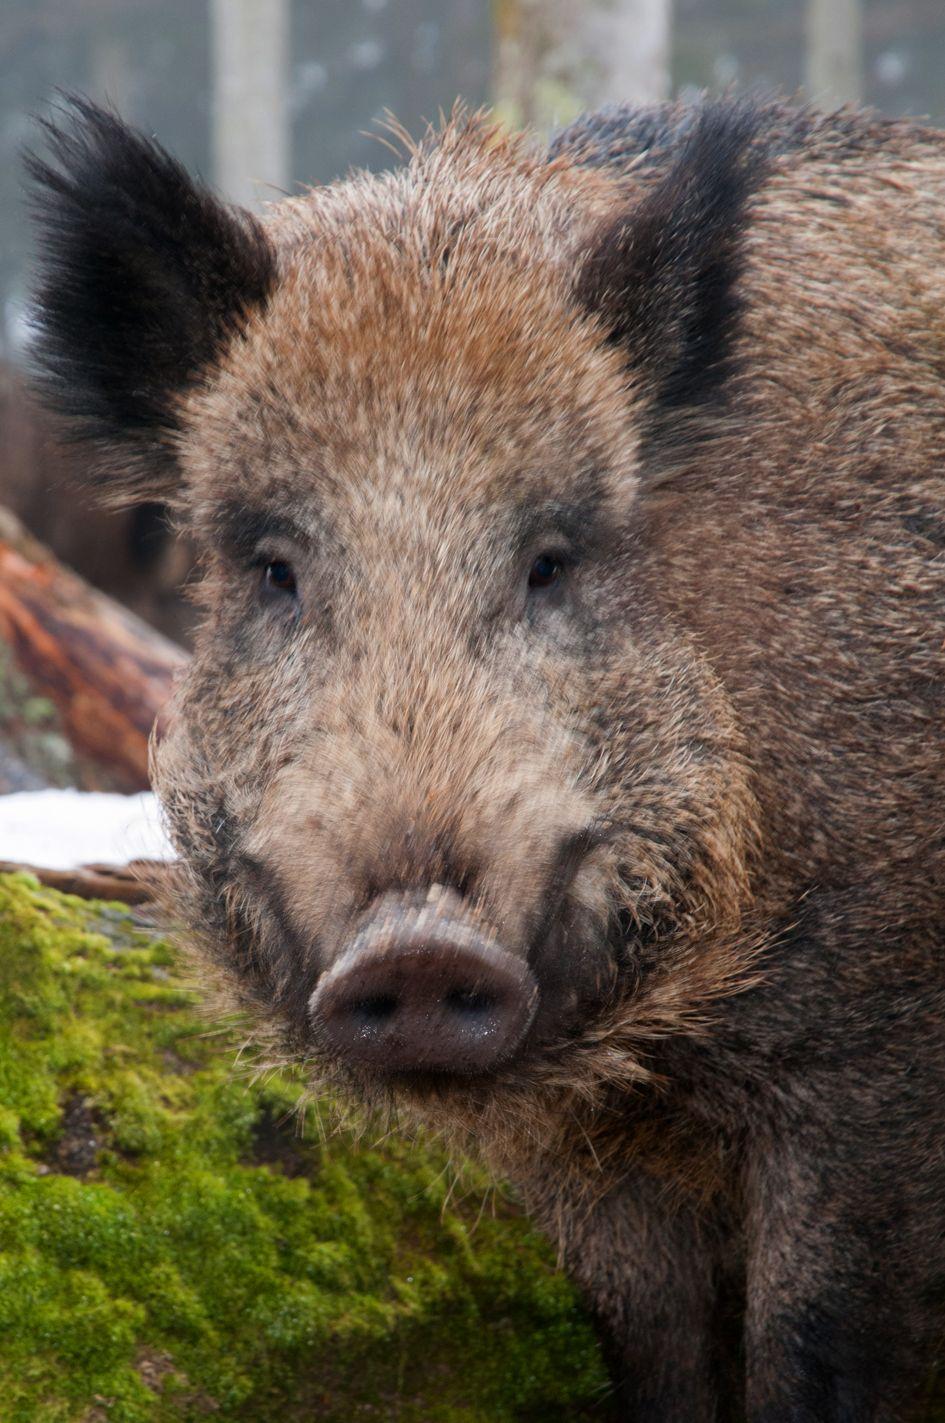 Bayerischer Wald, wild zwijn Bayern Forest, Germany, wild boar